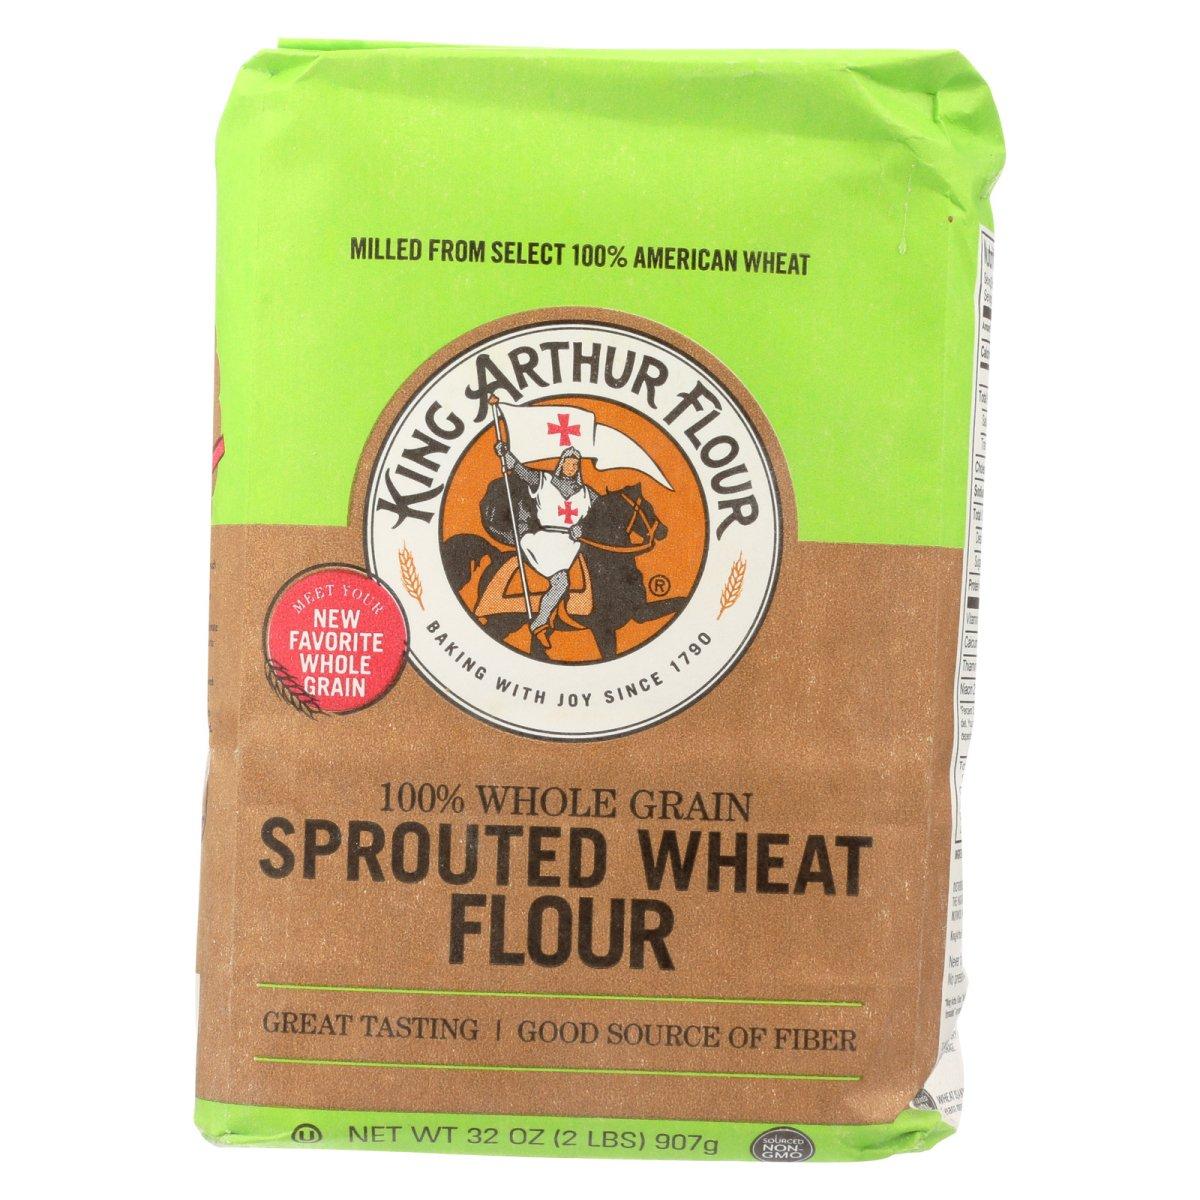 King Arthur 1829555 2 lbs Wheat Flour Natural Food - Case of 6